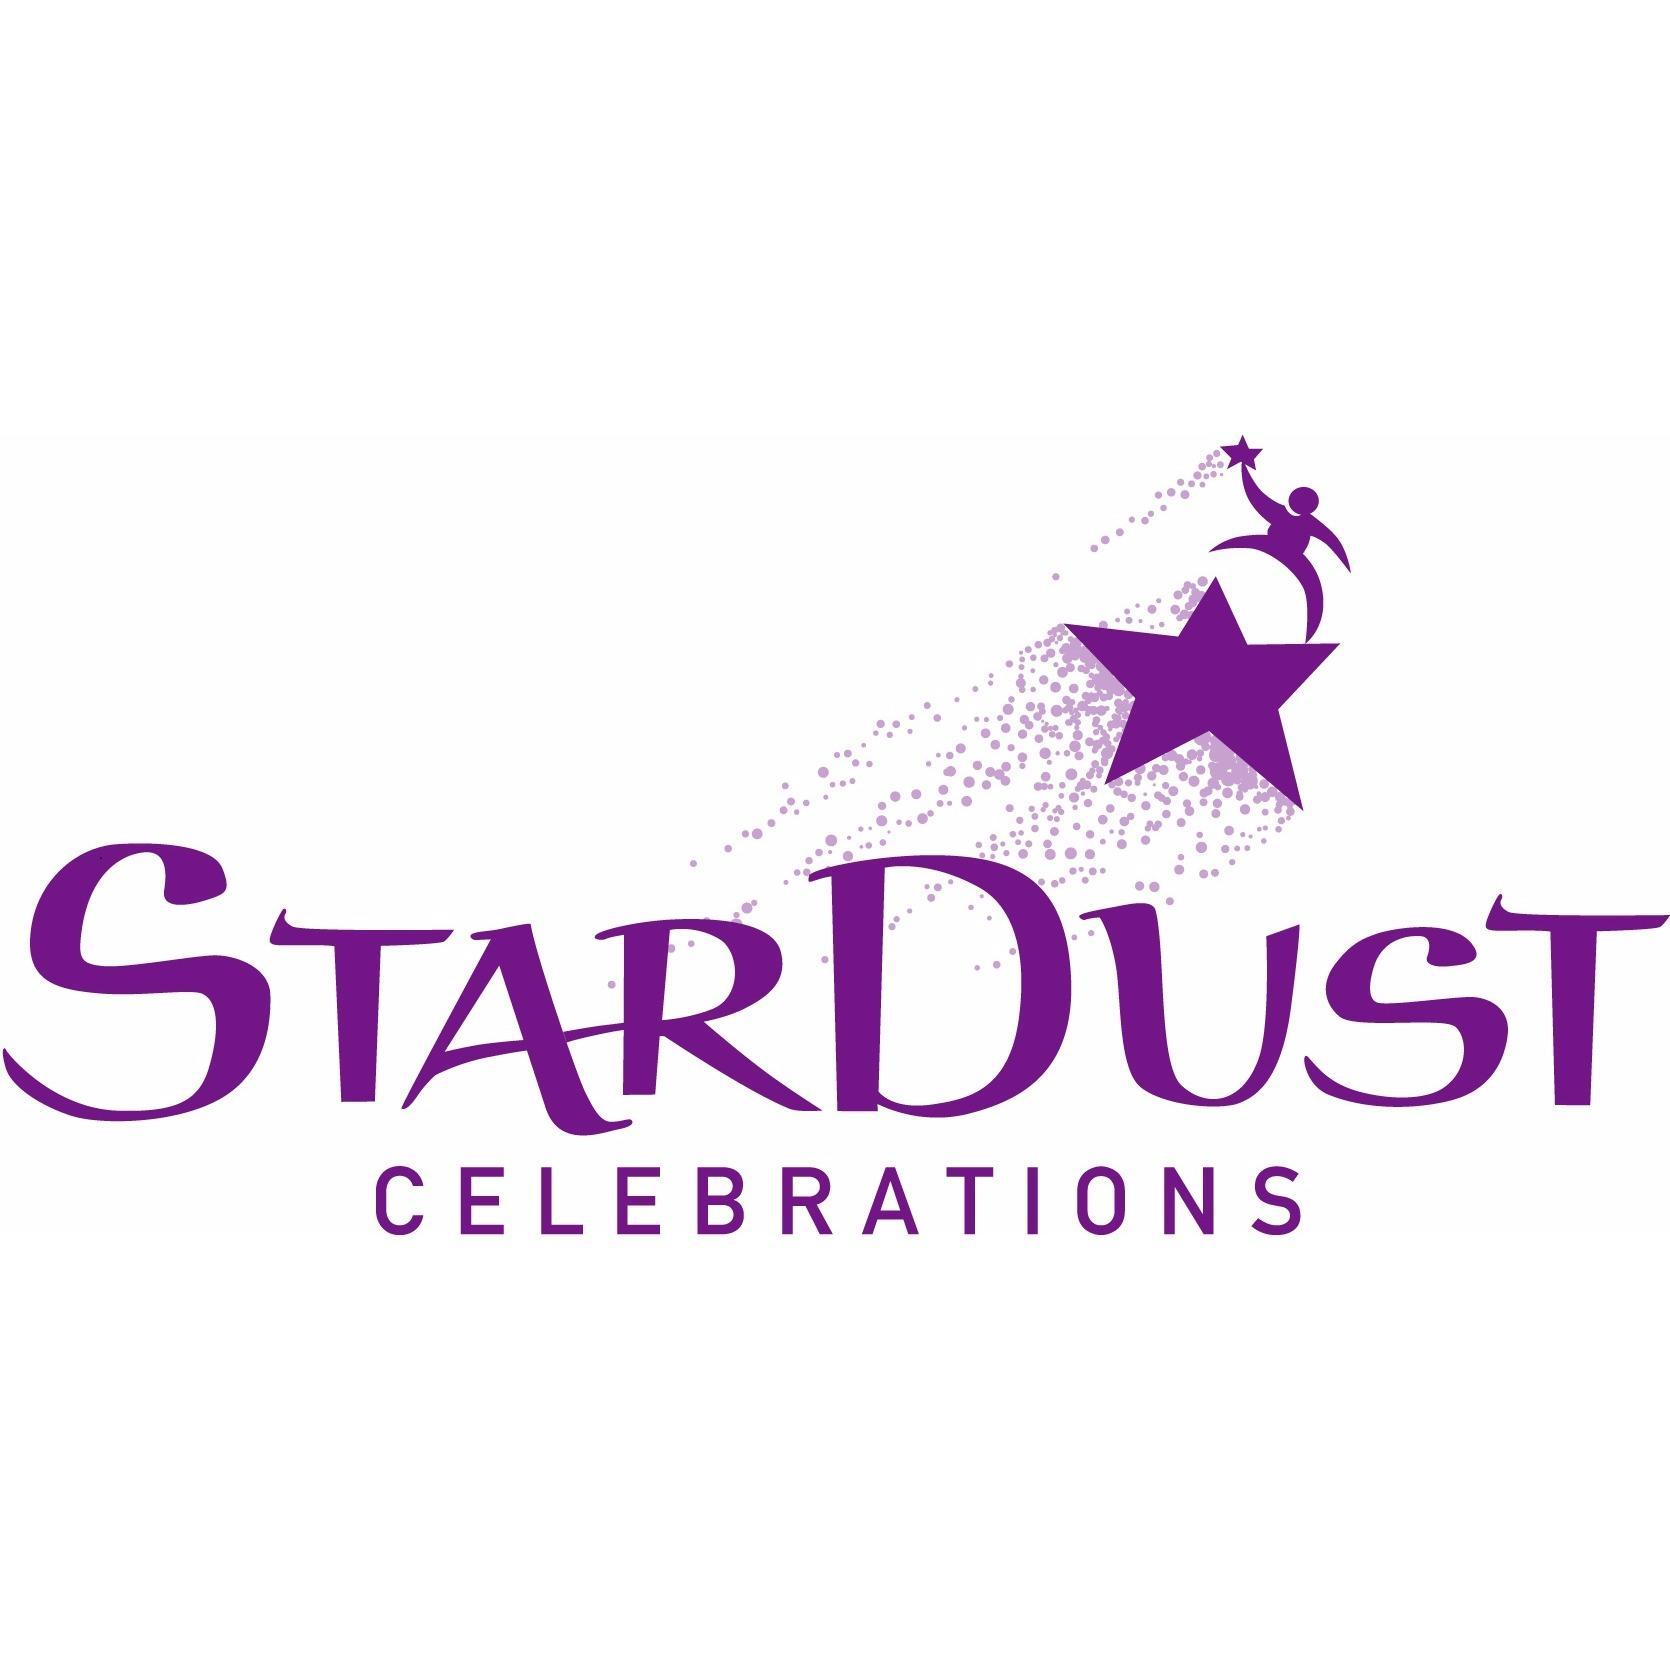 Stardust Celebrations